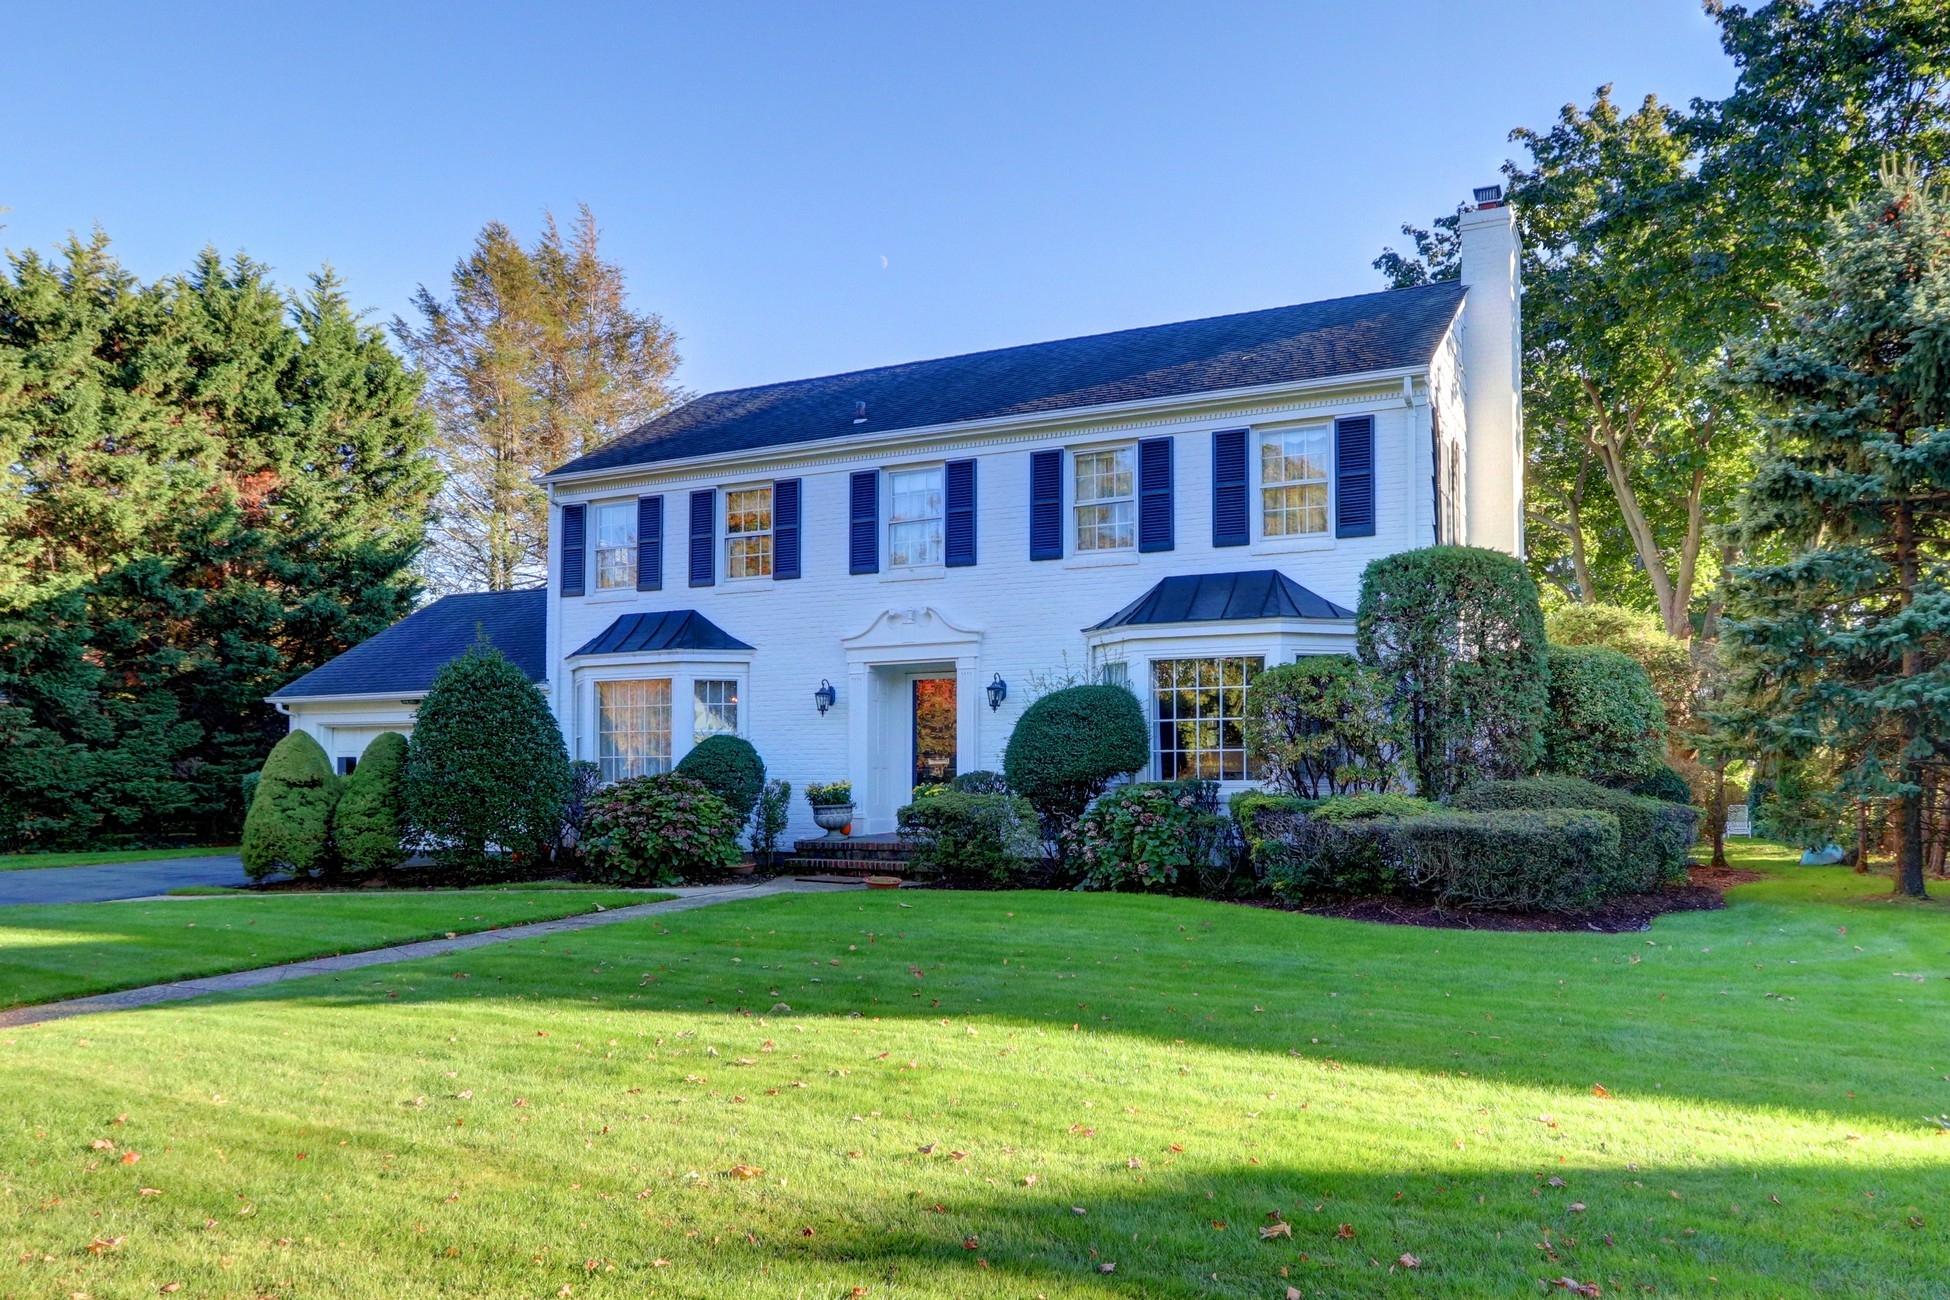 22 1st St Garden City Property Listing Mls 2981112